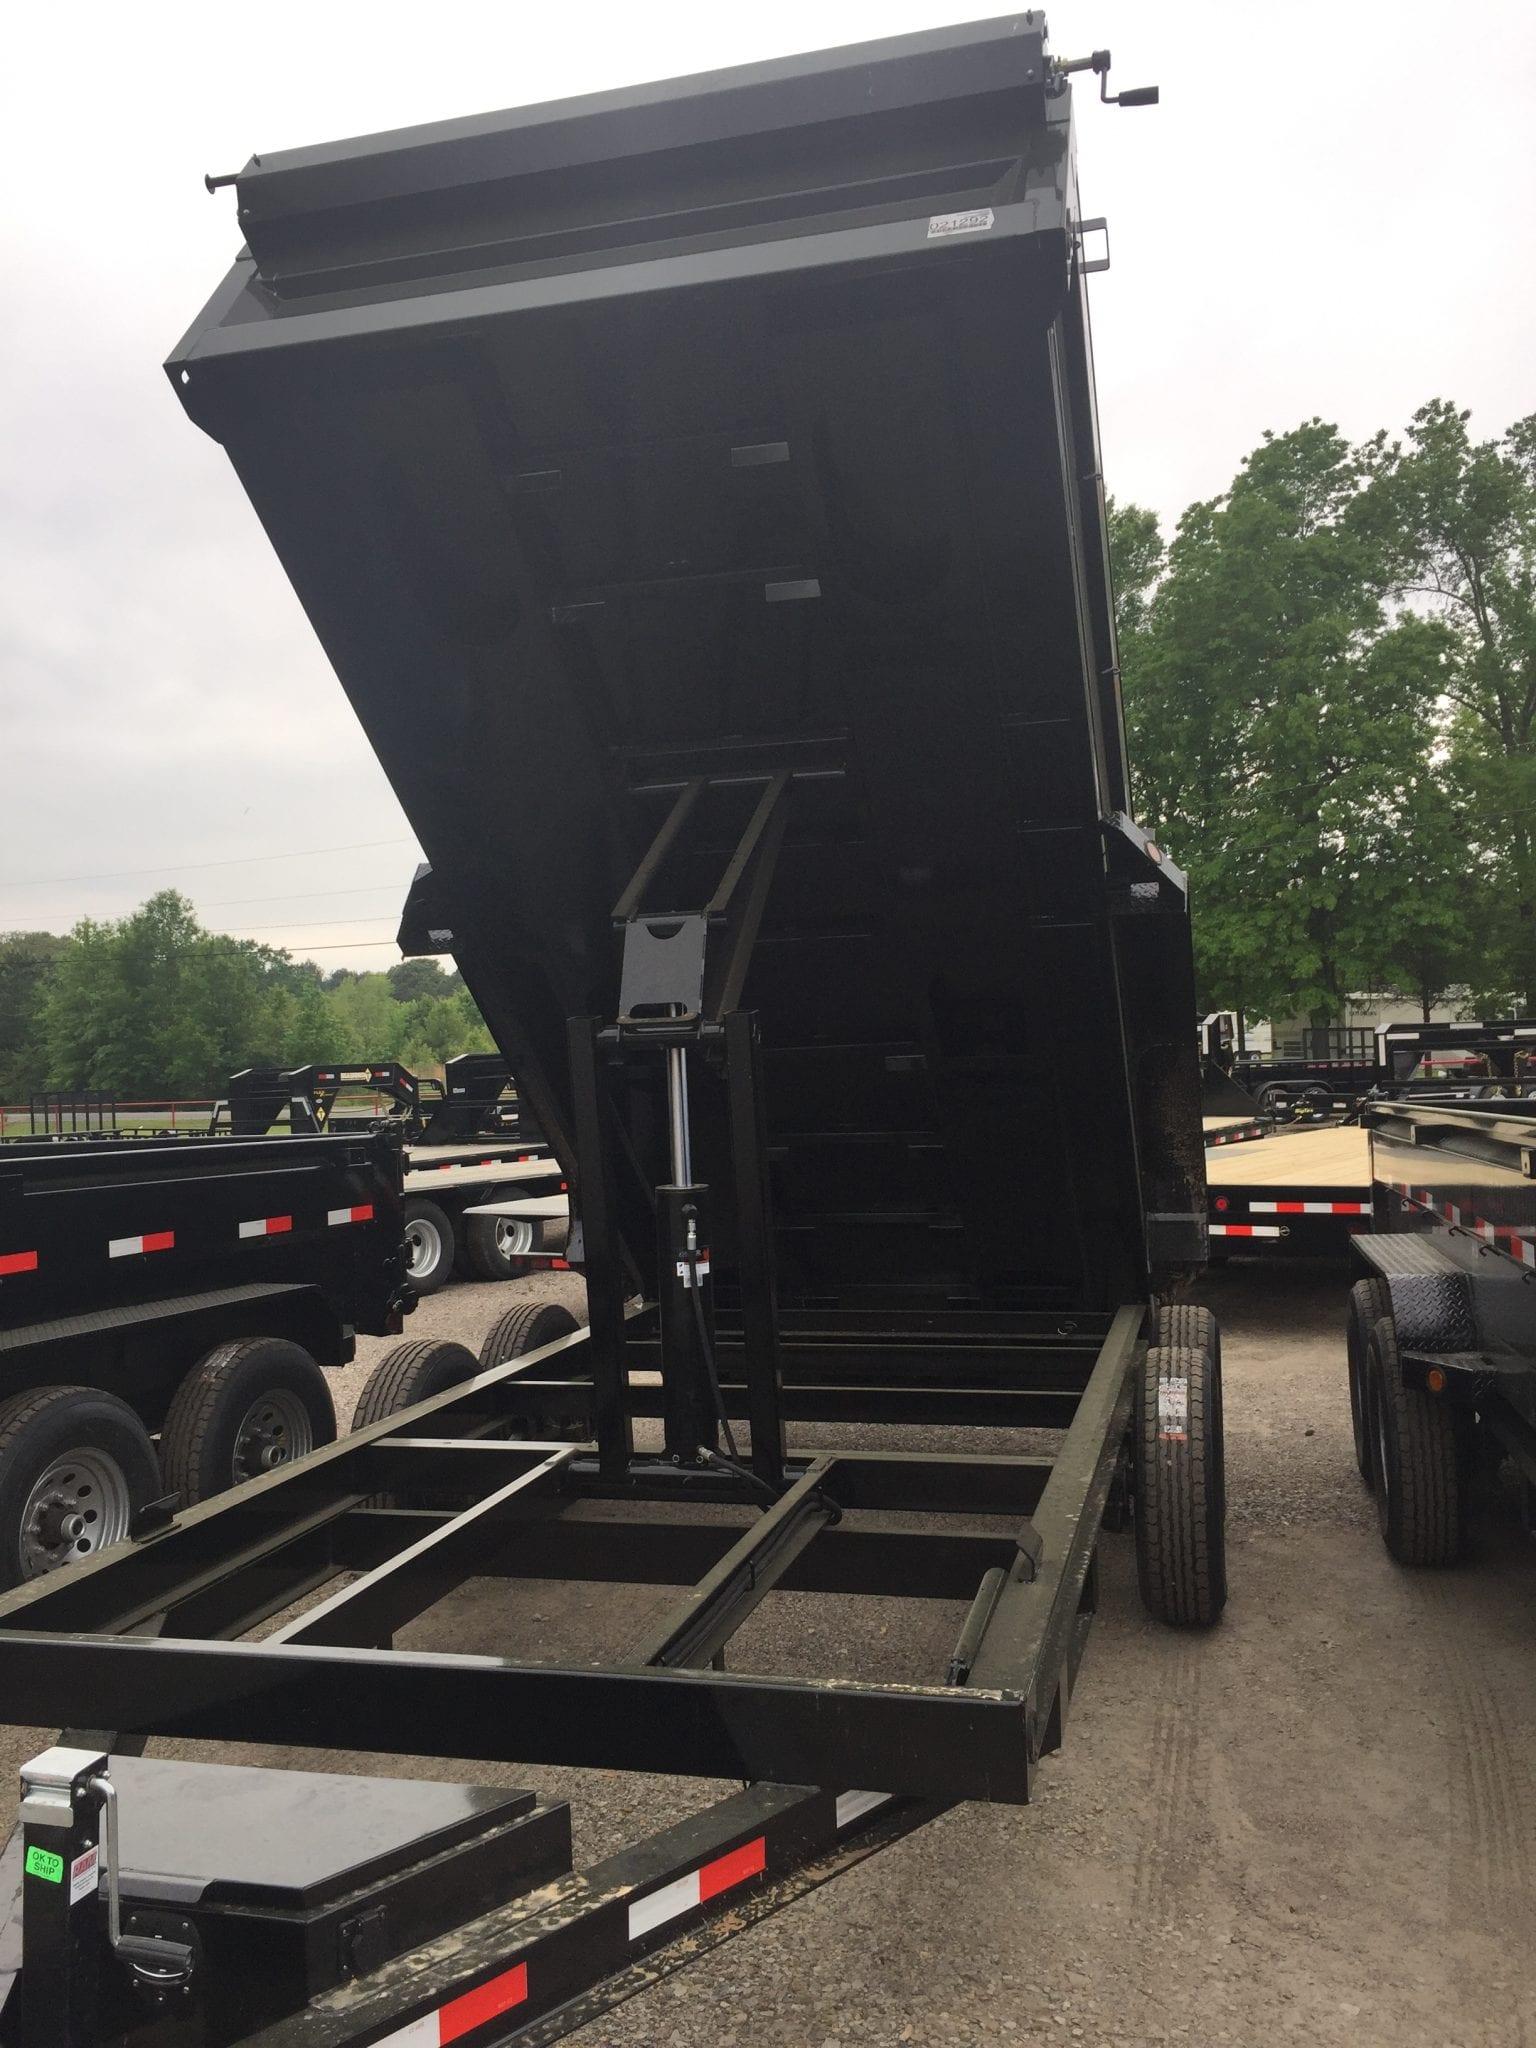 Car Corner Van Buren Ar >> Ironbull 16' Dump Trailer - Cornerstone Equipment Sales